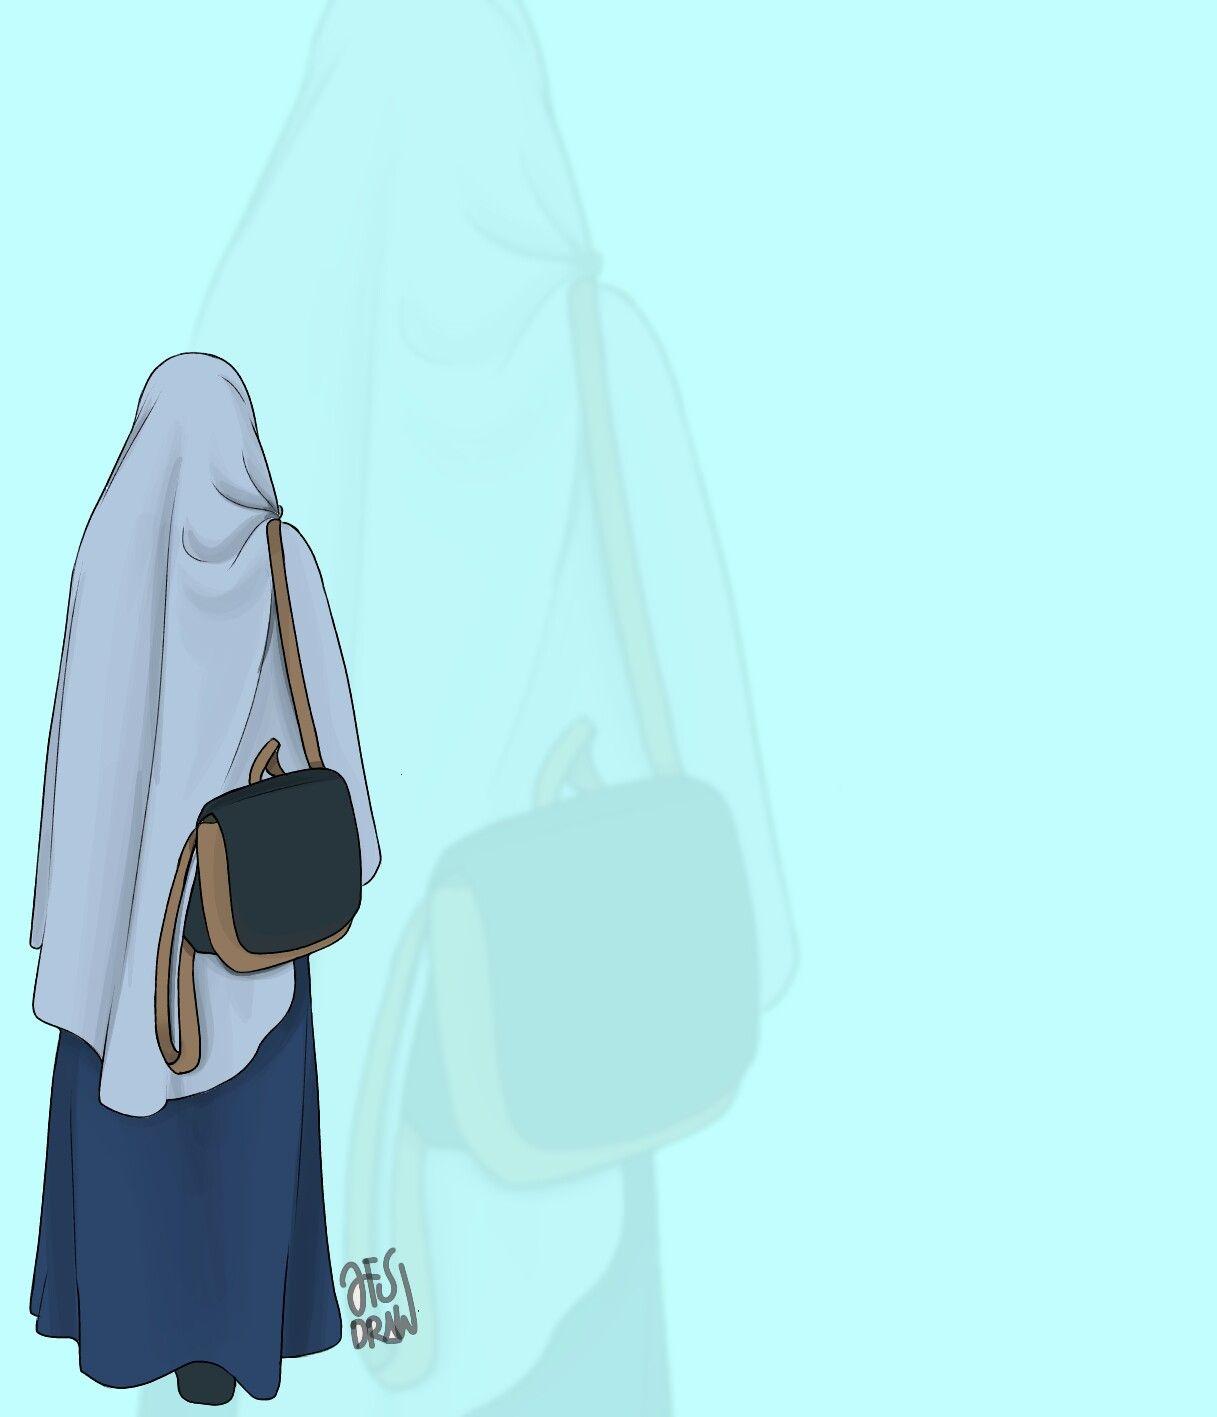 Tak Perlu Menjadi Tercantik Dari Sekian Banyak Wanita Cantik Cukup Jadi Wanita Yang Taat Agama Dan Menjaga Sikap Itu Sudah Lebih D Kartun Gambar Seni Islamis